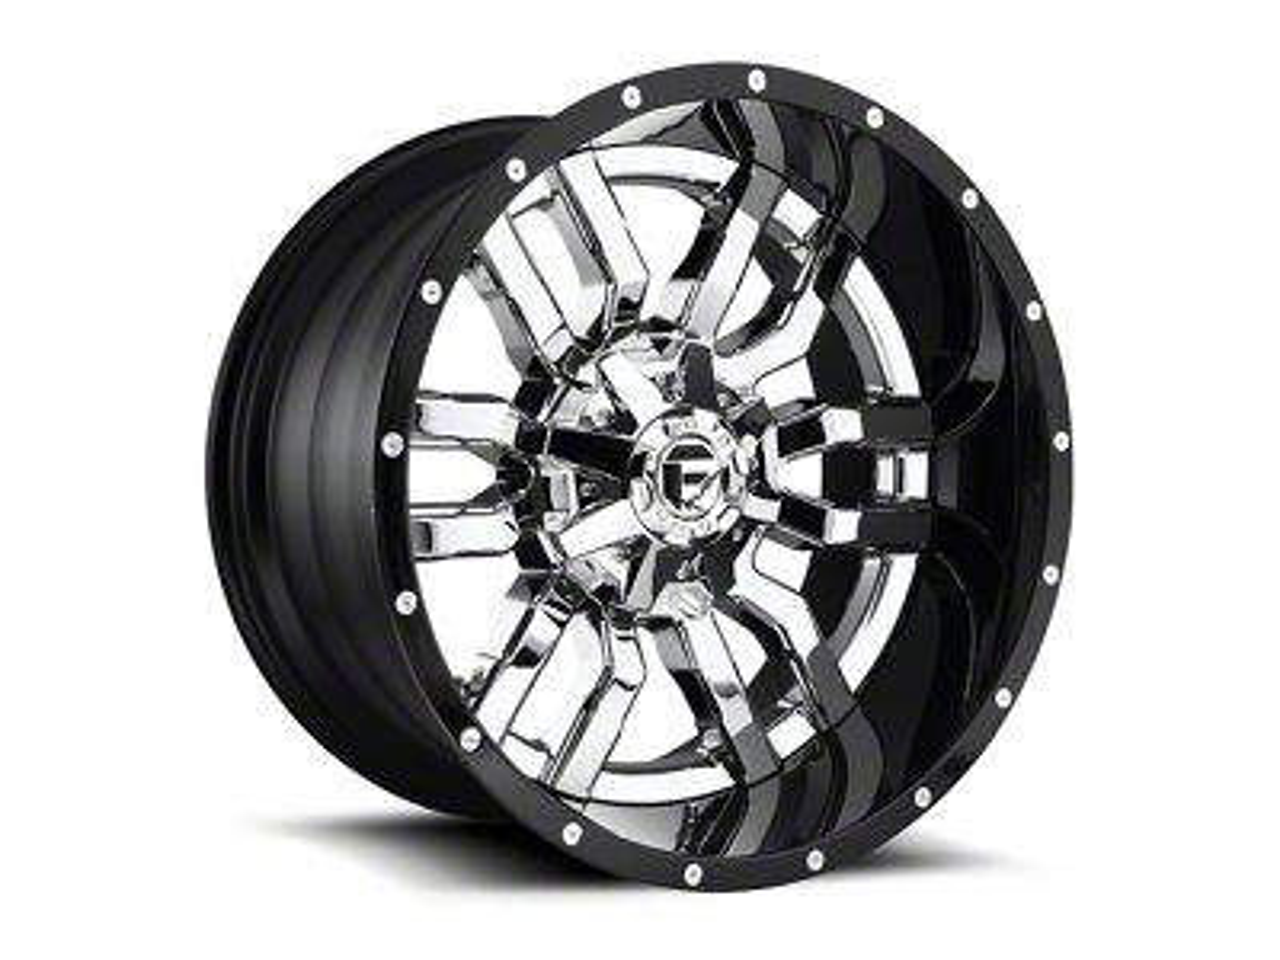 Fuel Wheels Sledge Chrome 5-Lug Wheel - 22x12 (02-18 RAM 1500, Excluding Mega Cab)